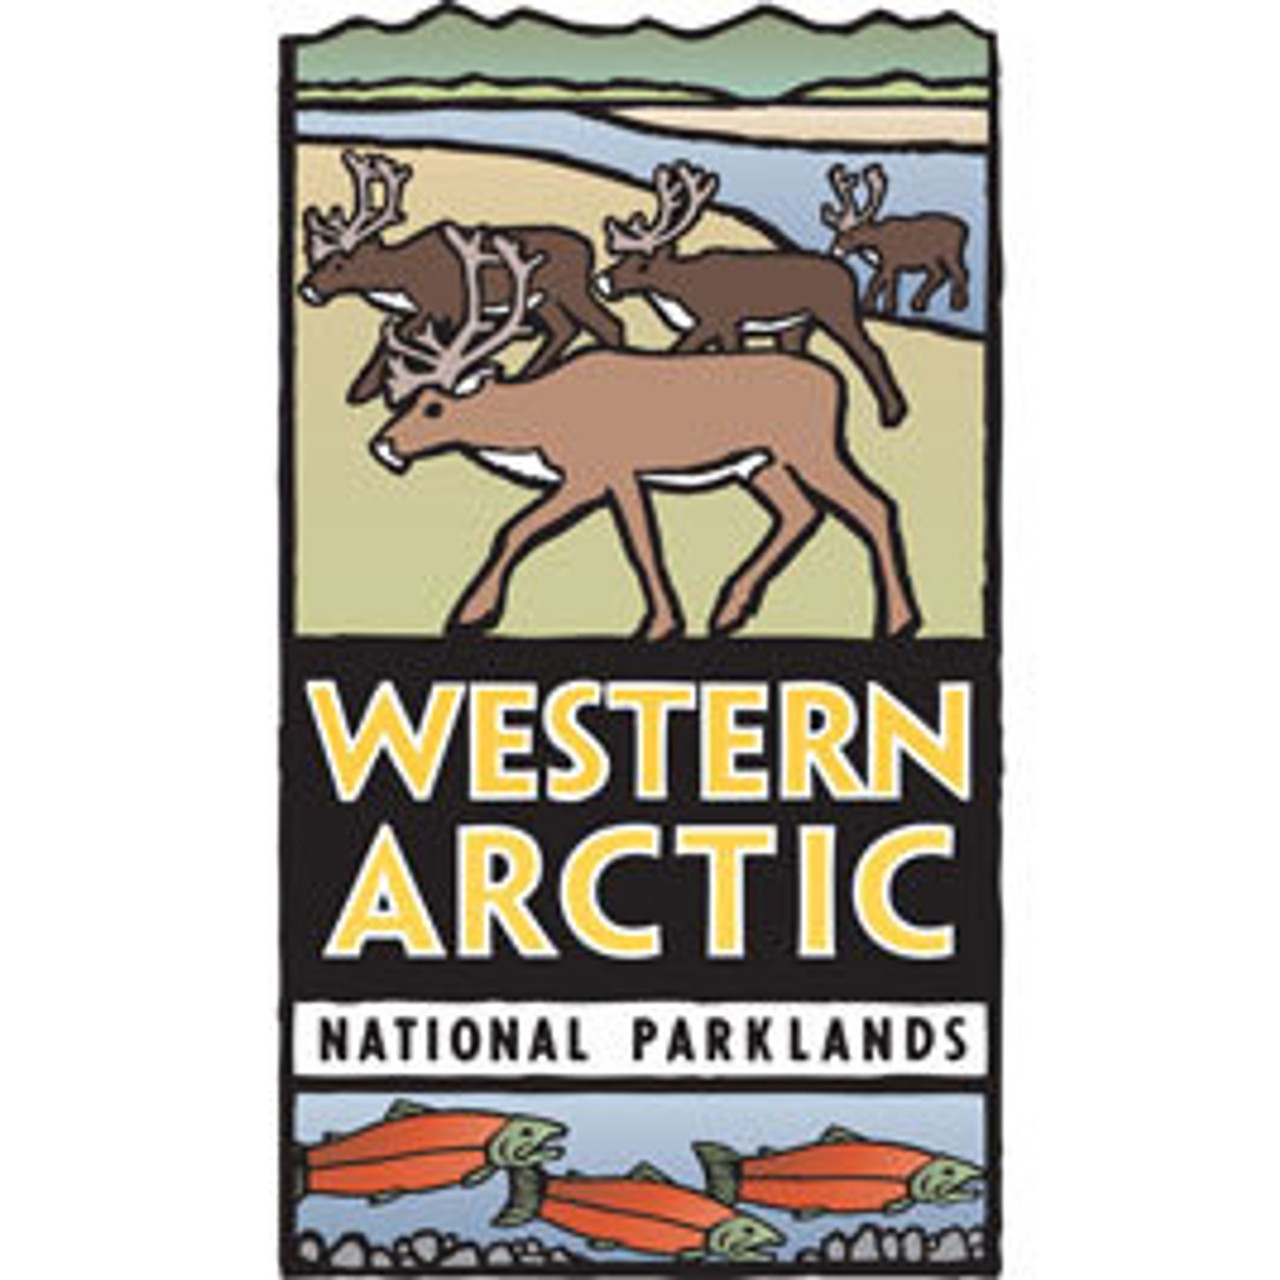 Western Arctic National Parklands